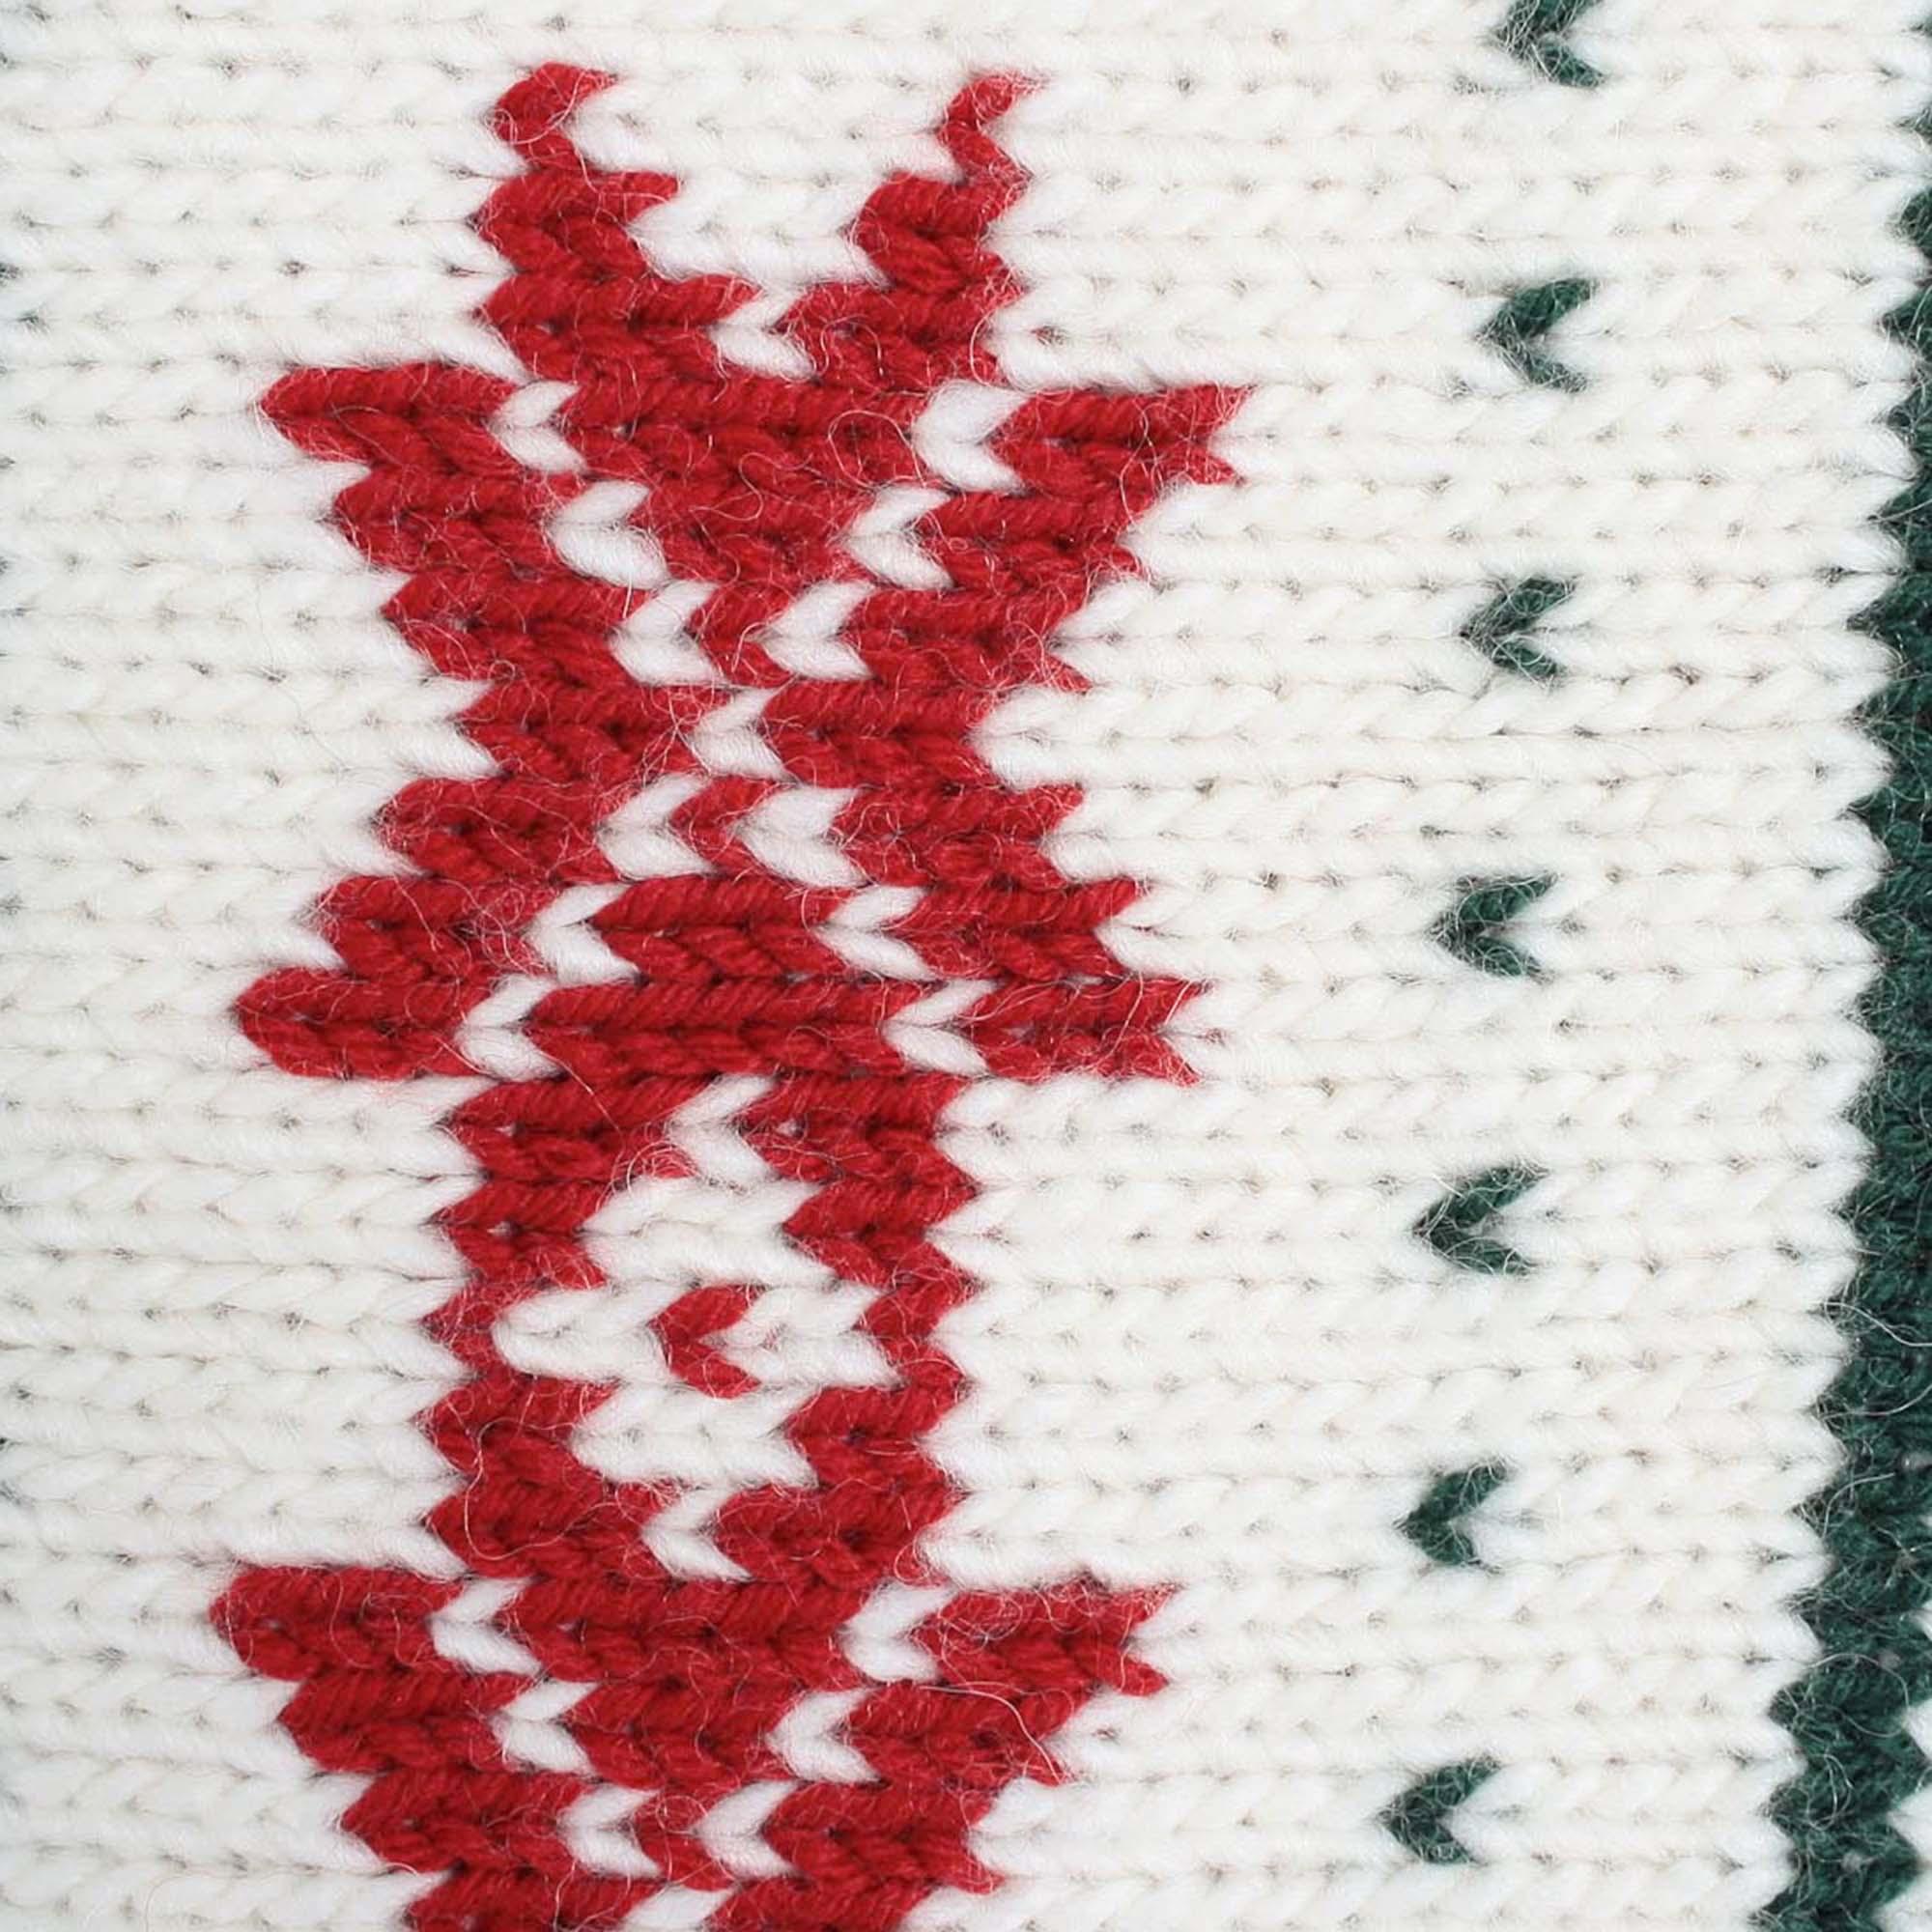 Zoo di lana coperta bucaneve in lana ecologica for Piani di coperta online